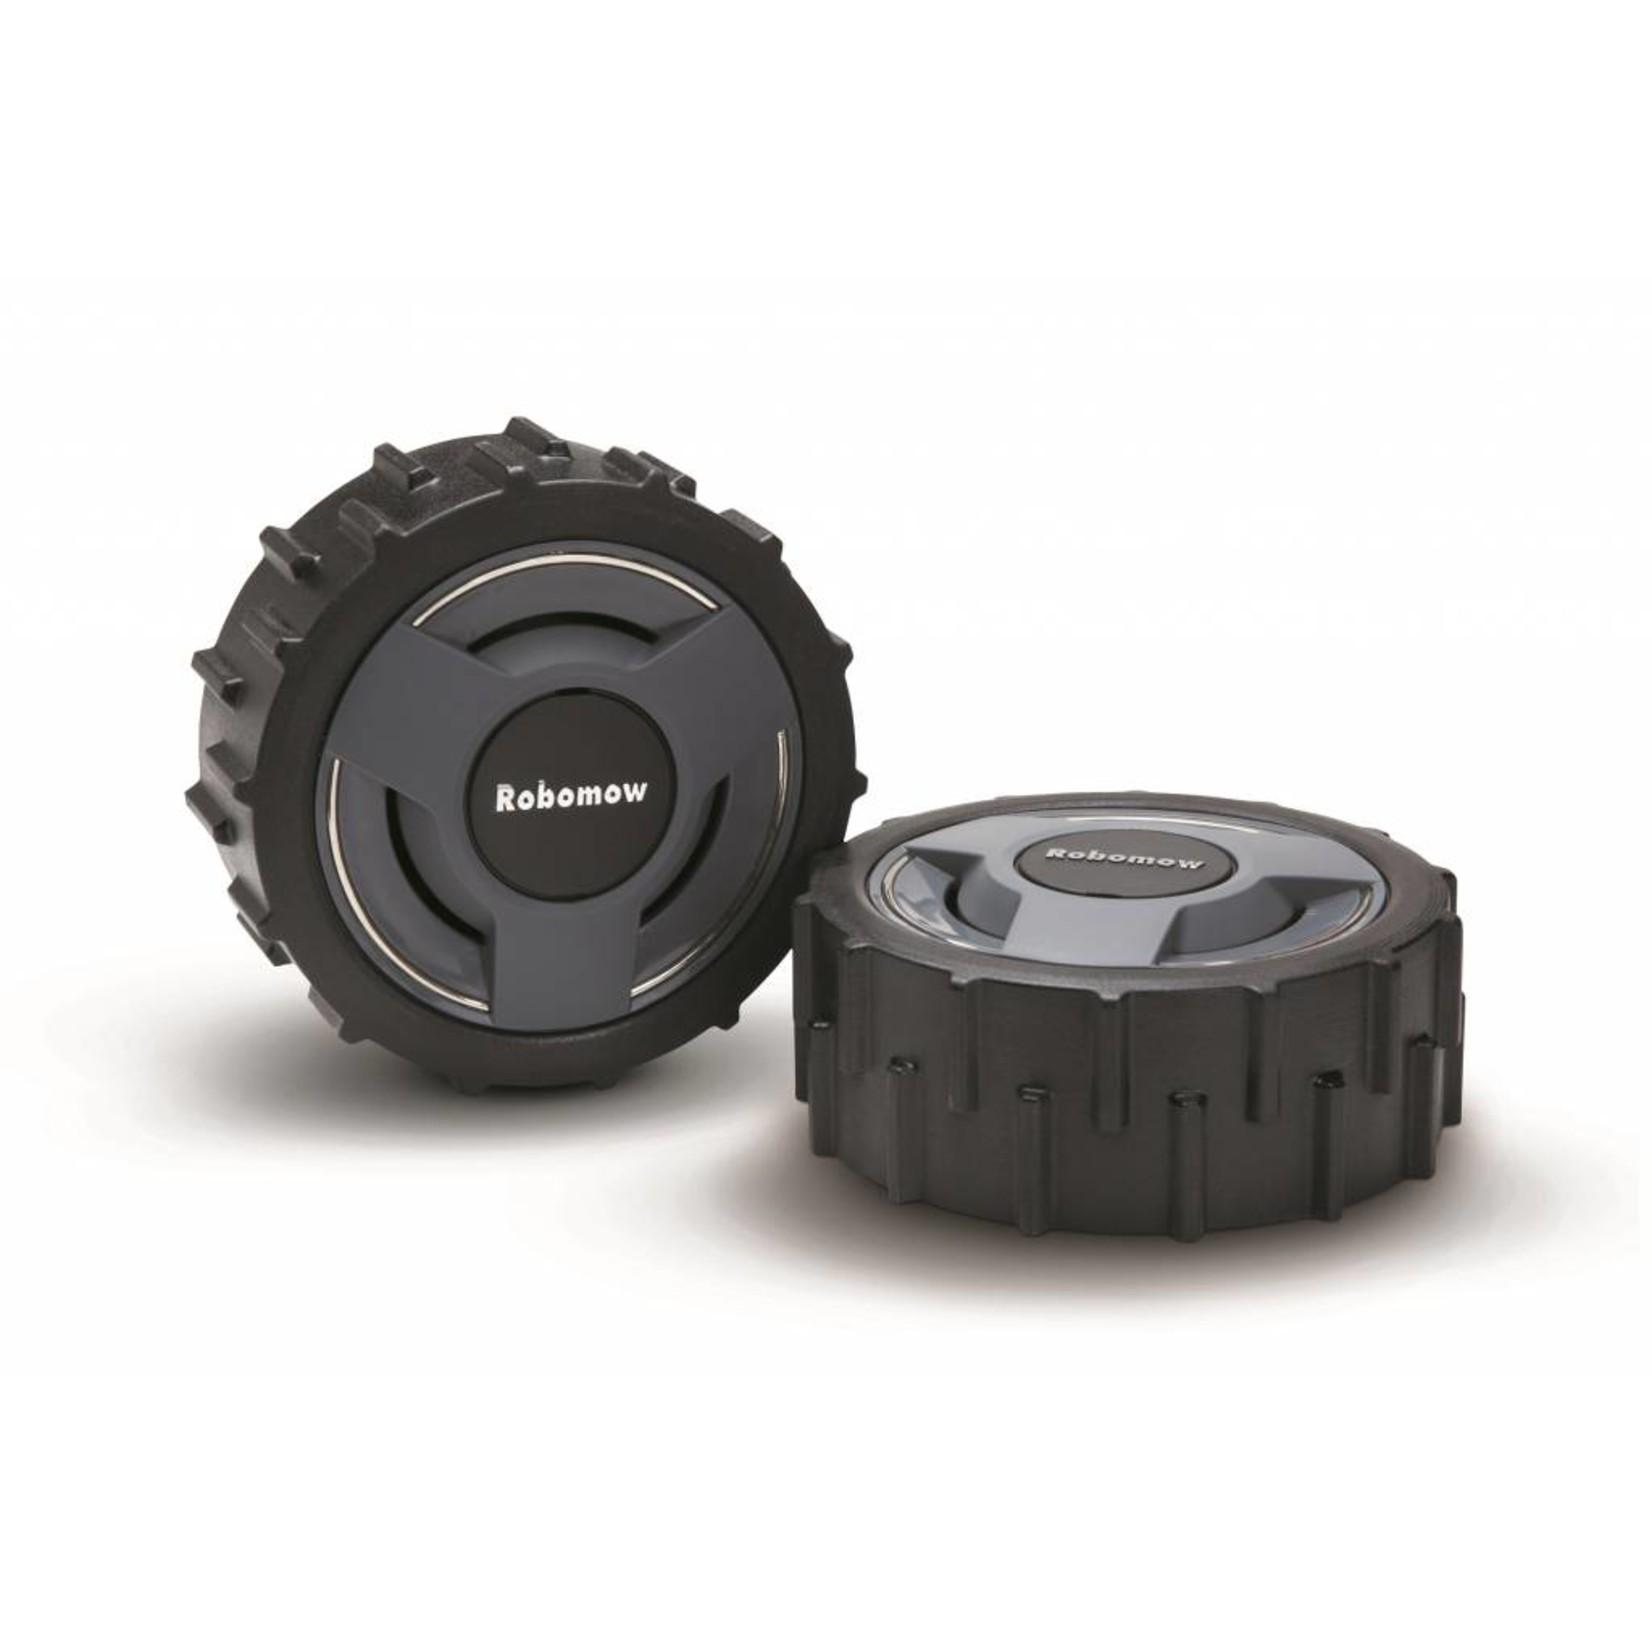 Robomow Robomow Power Wheels Räder für RS-Serie MRK6107A